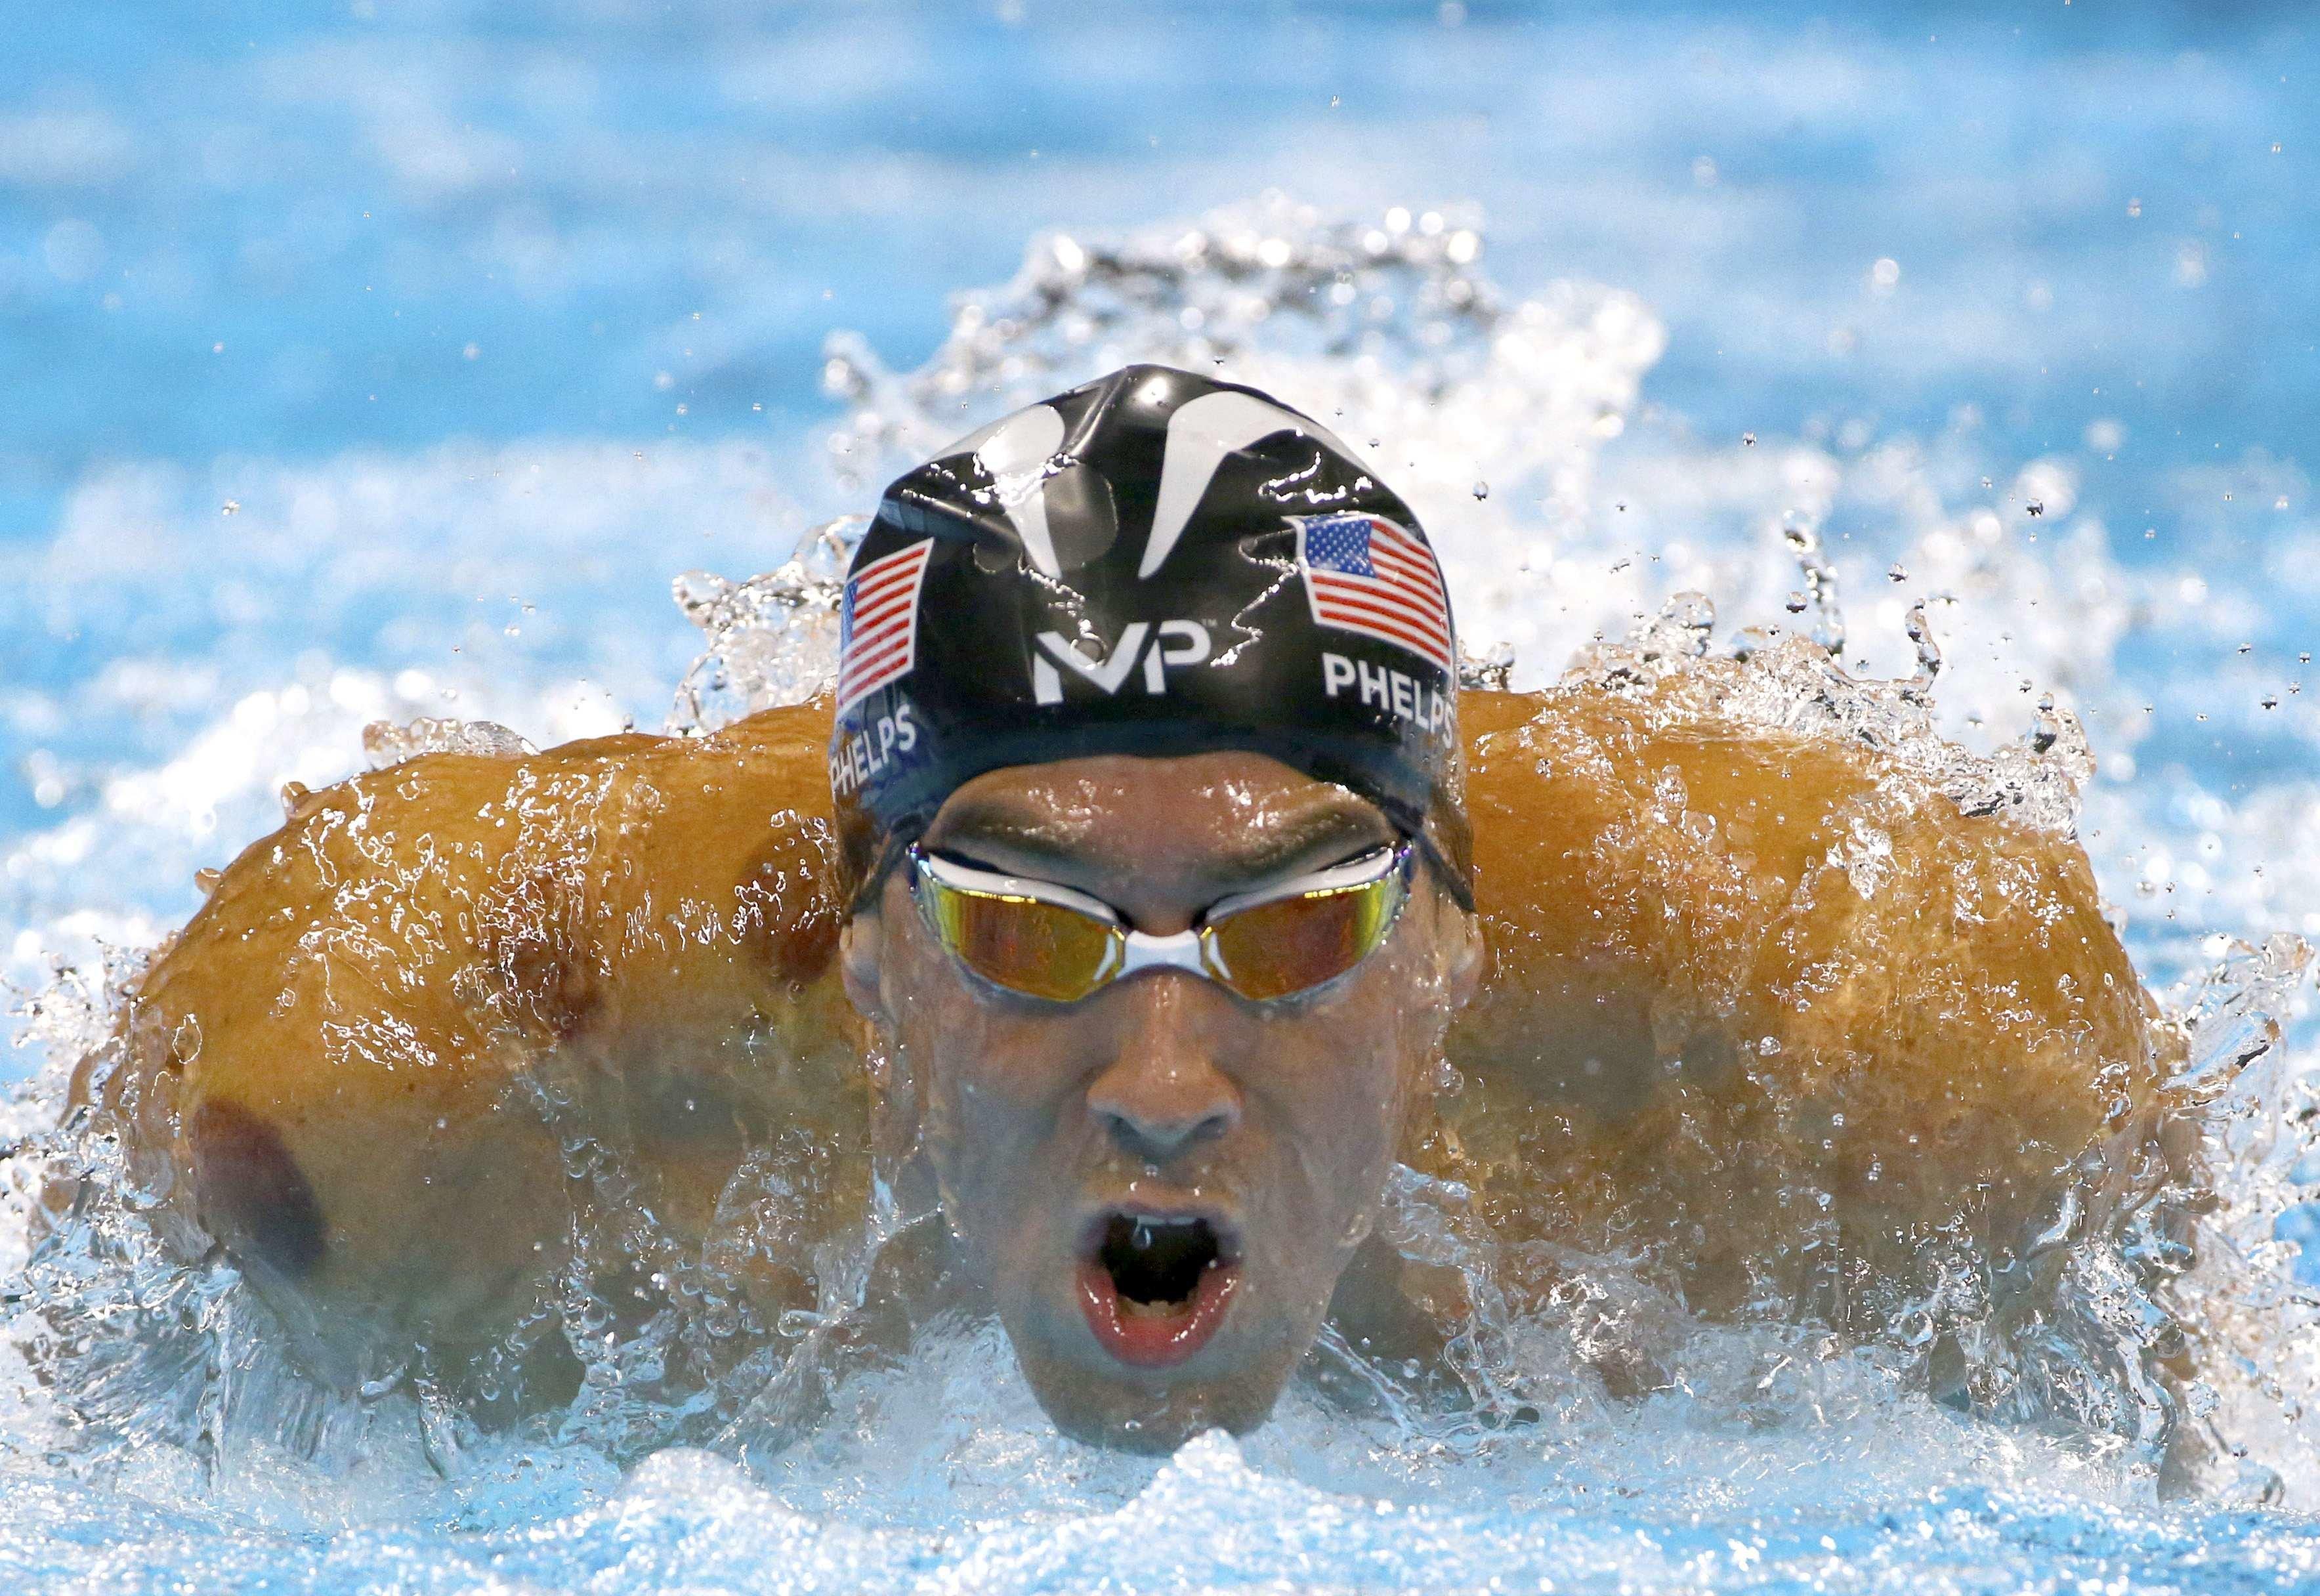 Michael Phelps swimming in the men's 200m butterfly semifinal in Rio de Janeiro, Brazil in 2016.